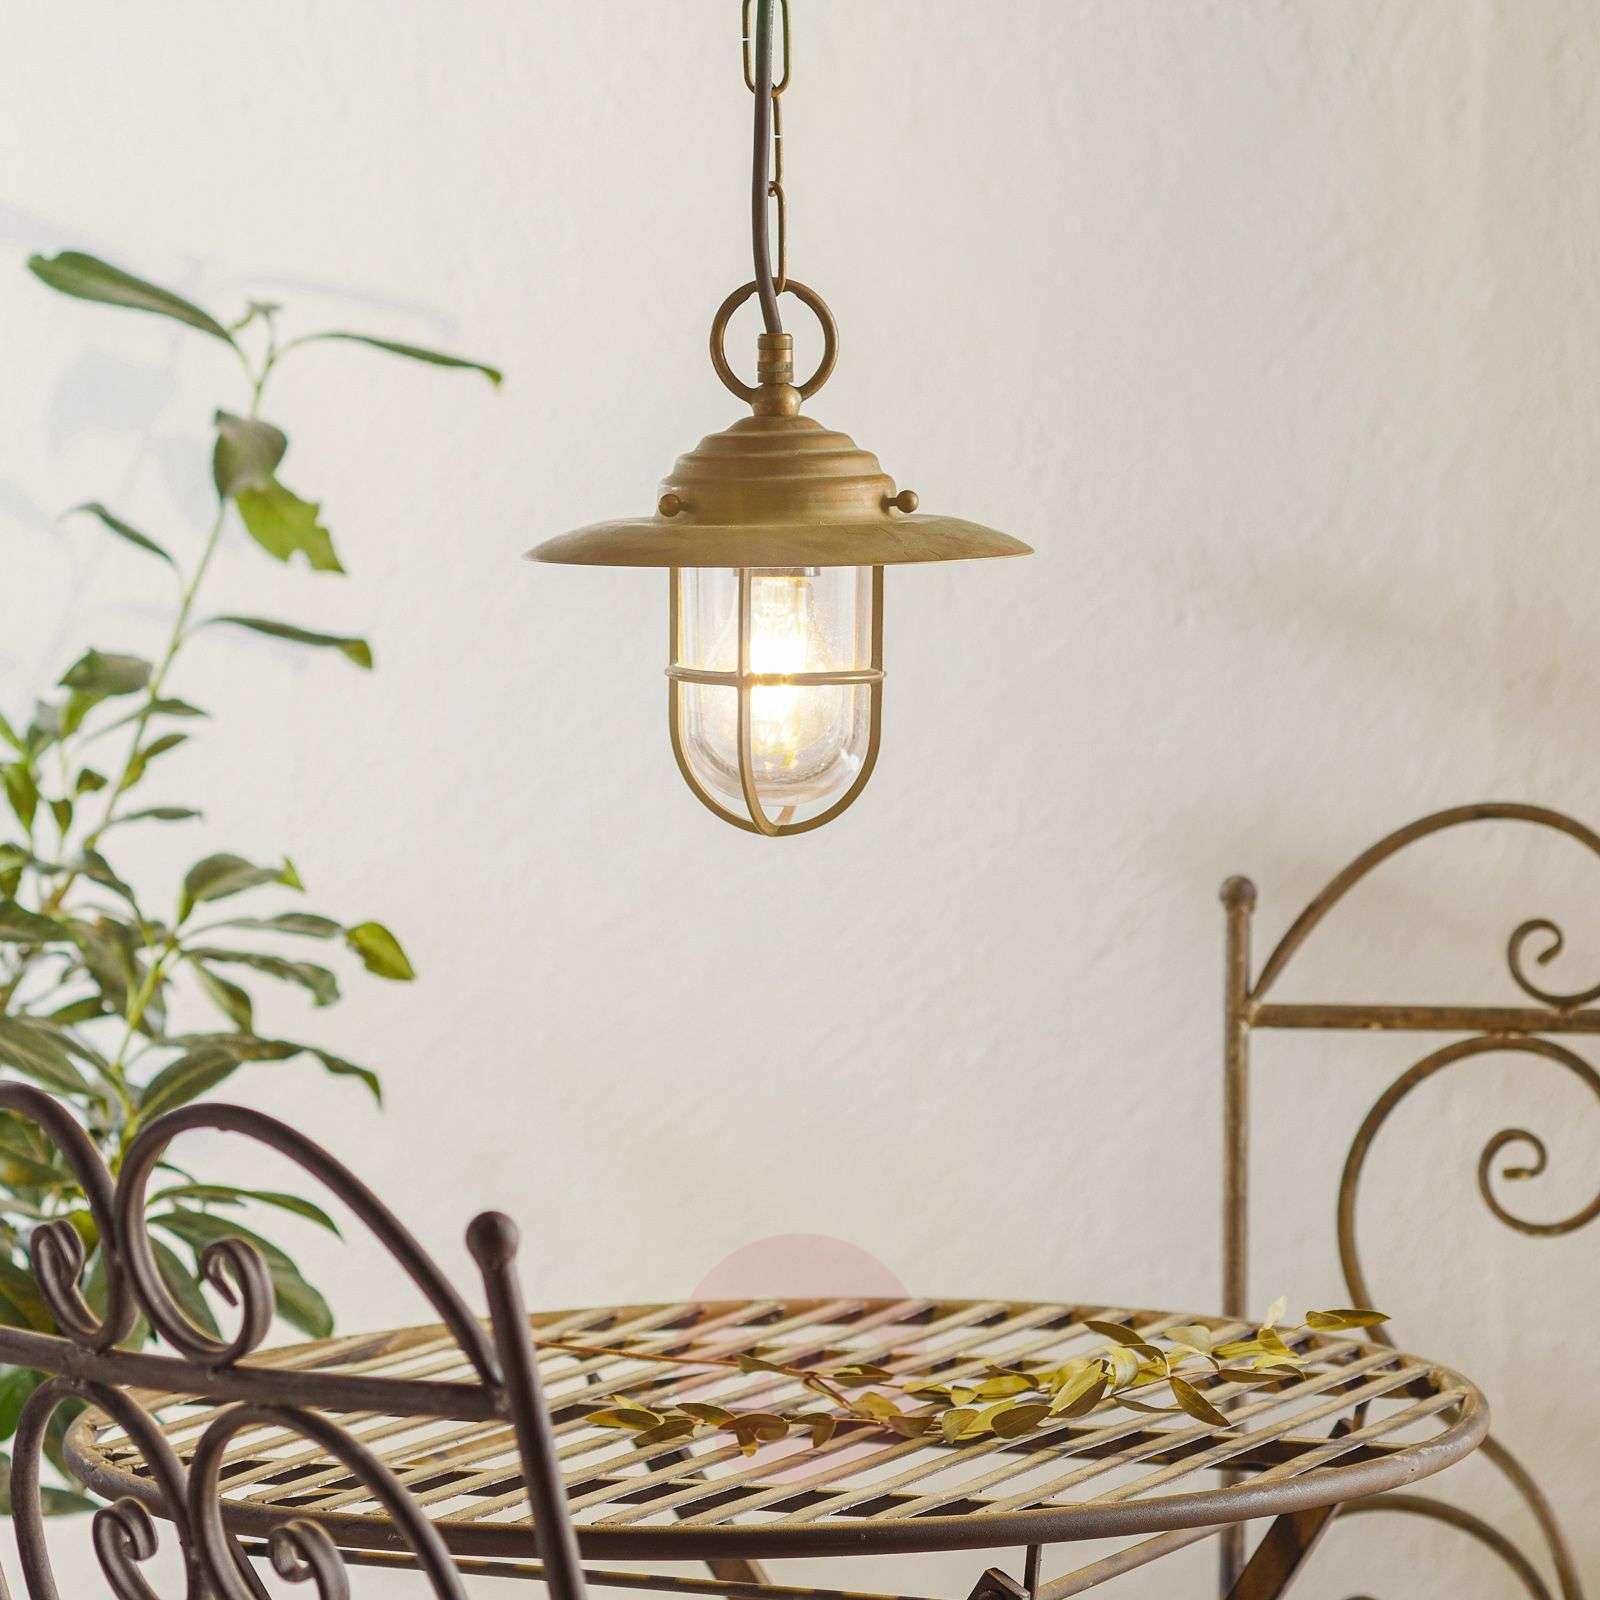 Bruno stylish hanging light for outdoors-6515368-01